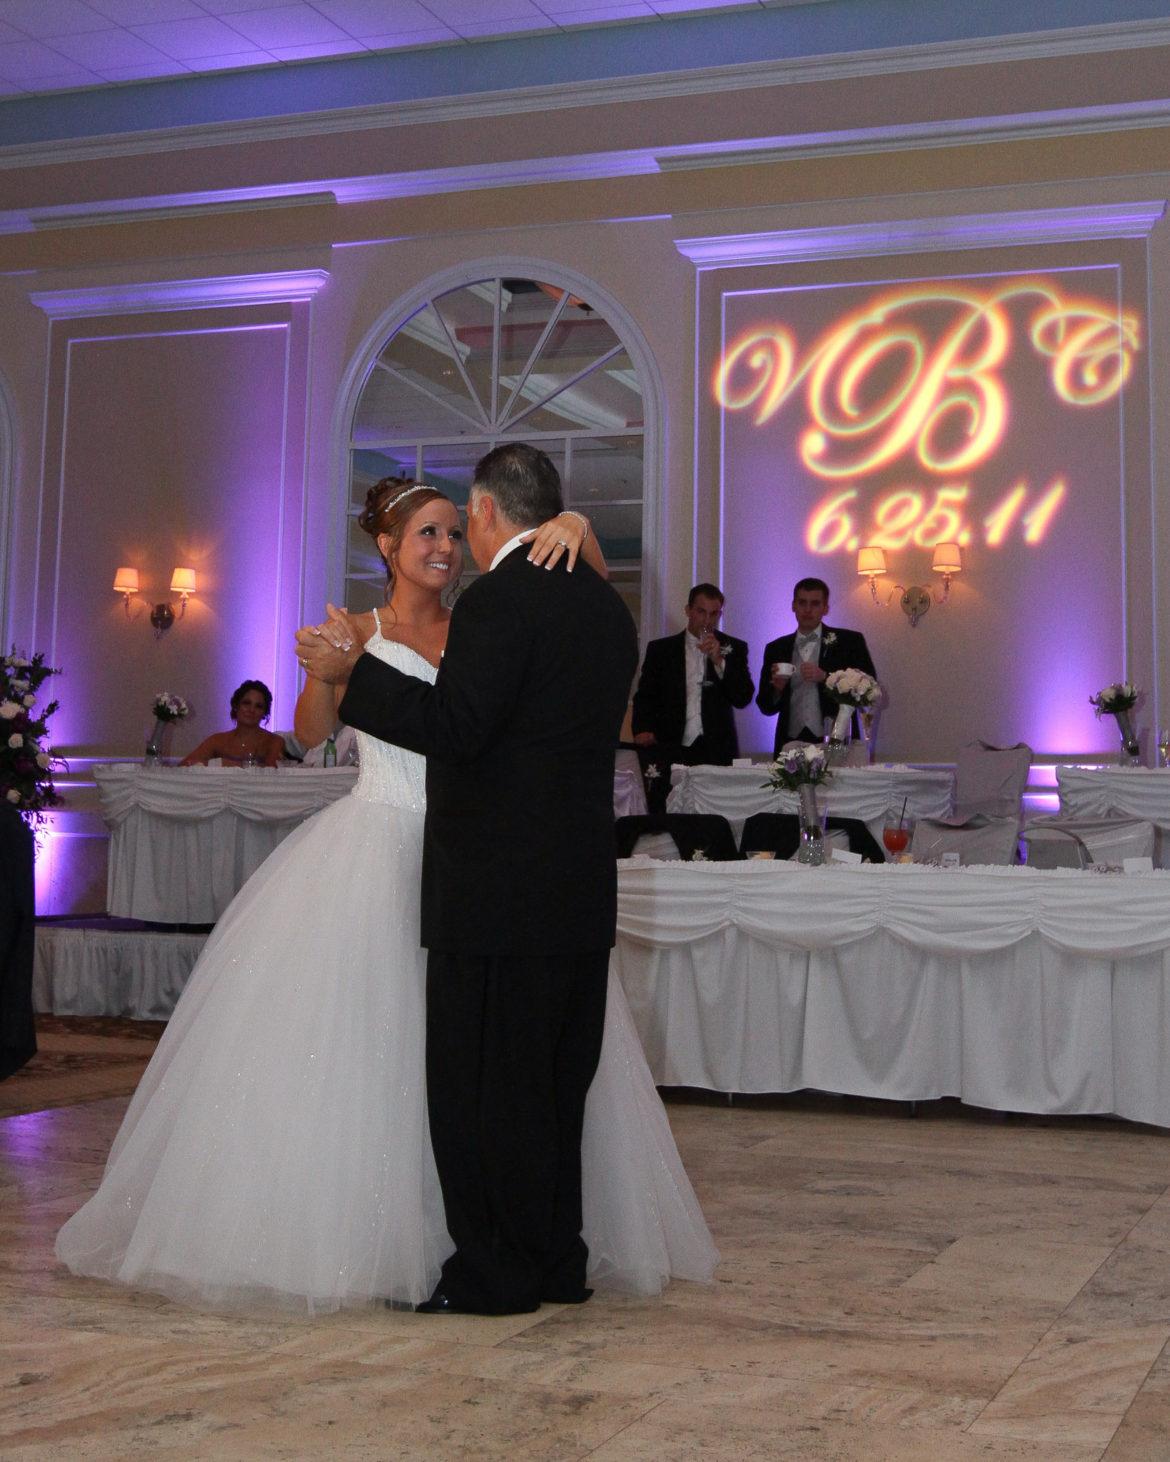 Elegant_Event_Lighting_Chicago_Venutis_Addison_Wedding_Purple_LED_Uplighting_Monogram